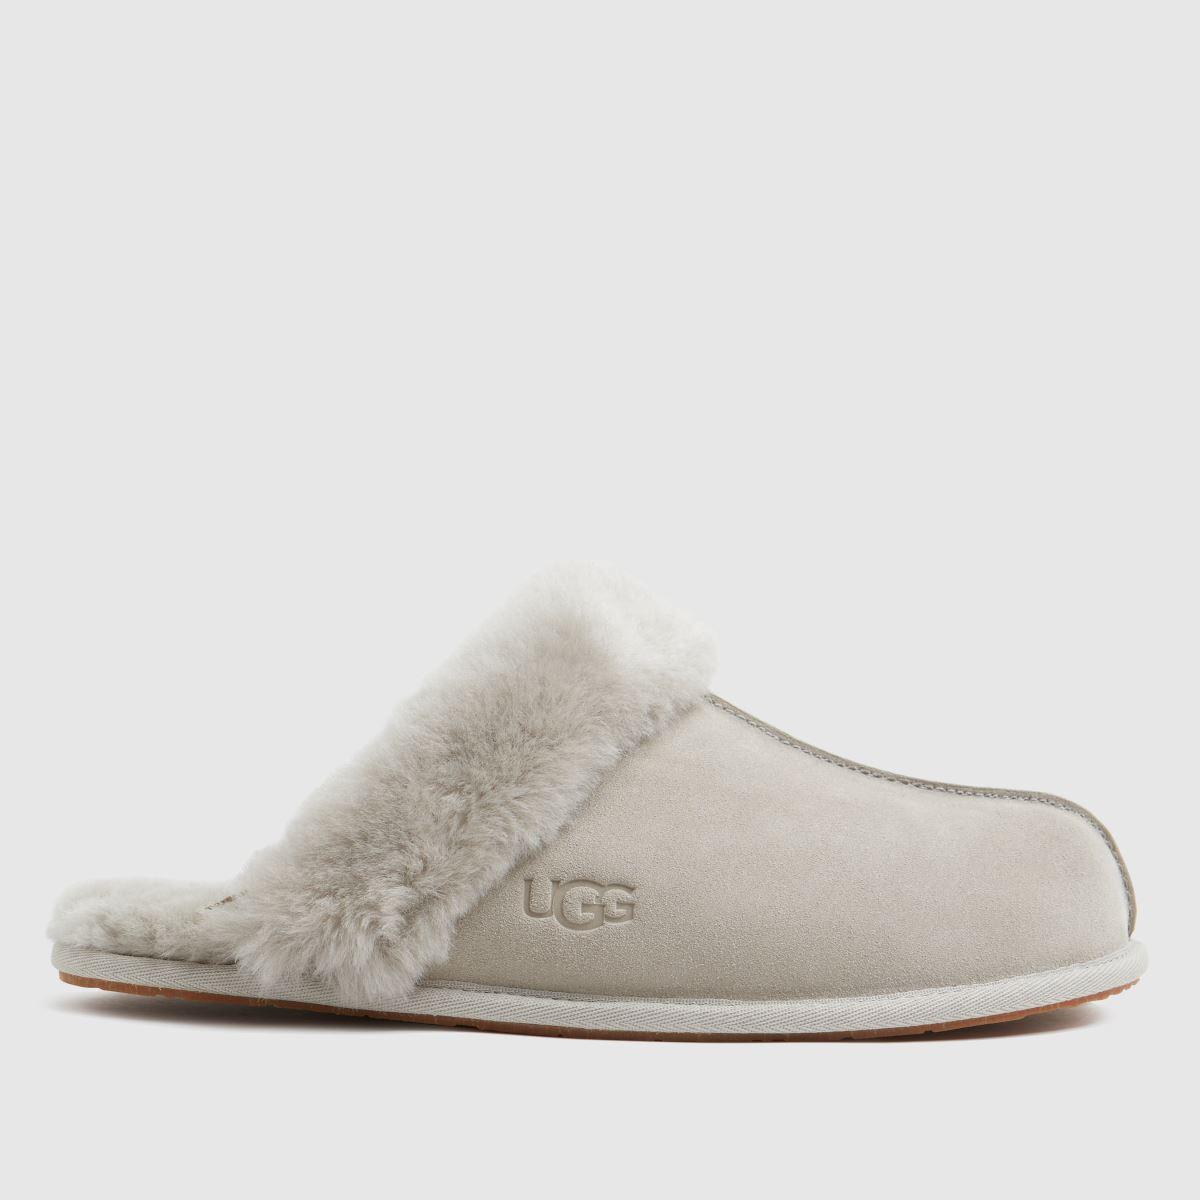 UGG Light Grey Scuffette Slippers